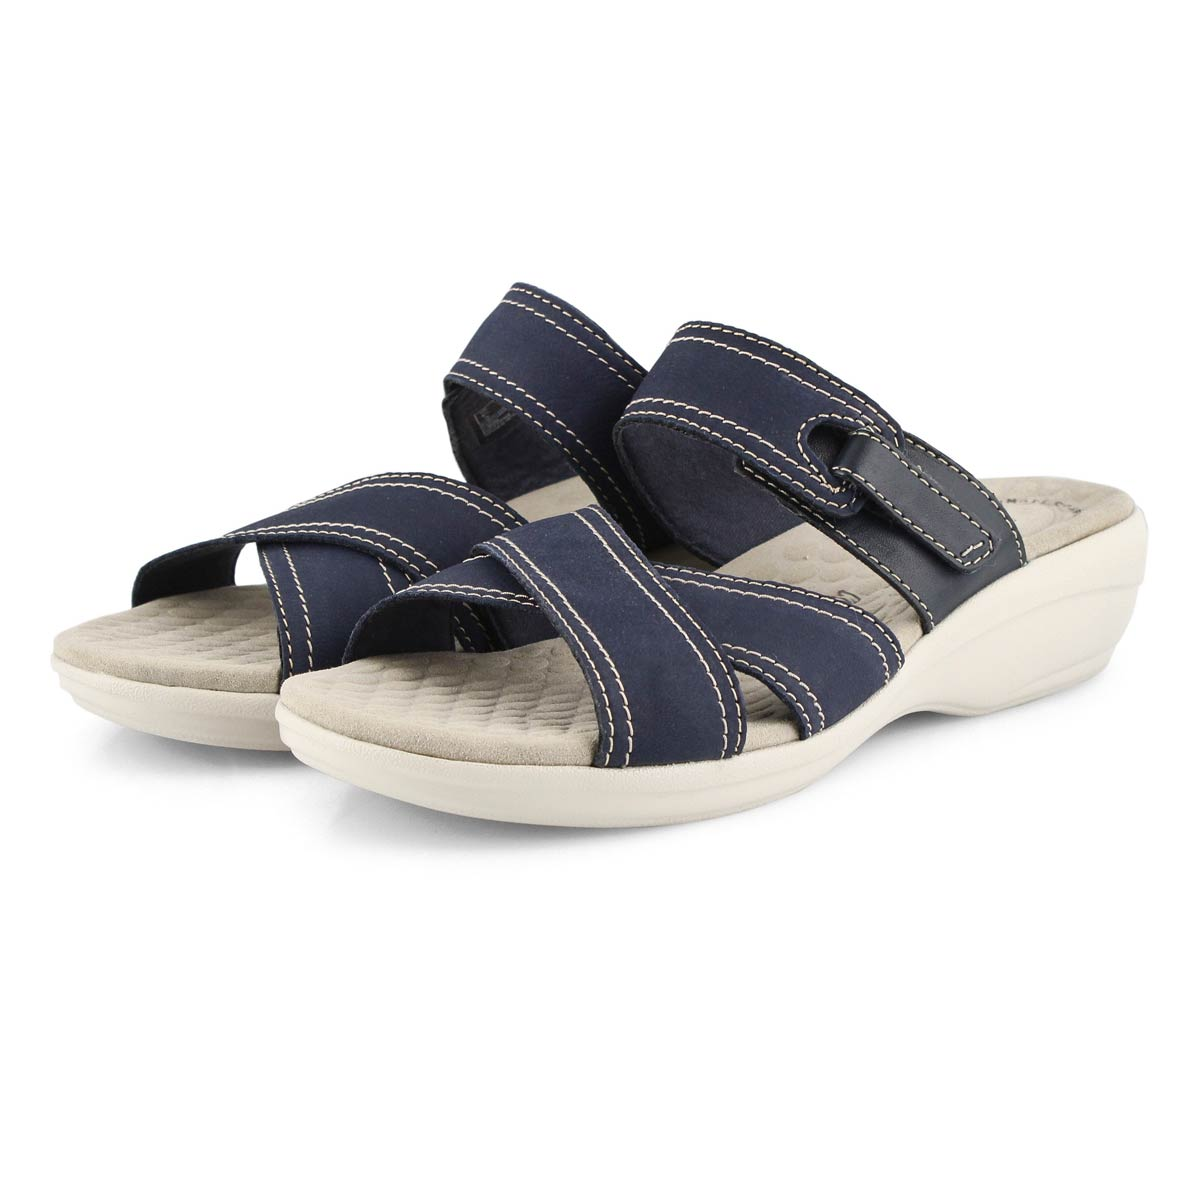 Lds Alexis Art navy casual slide sandal